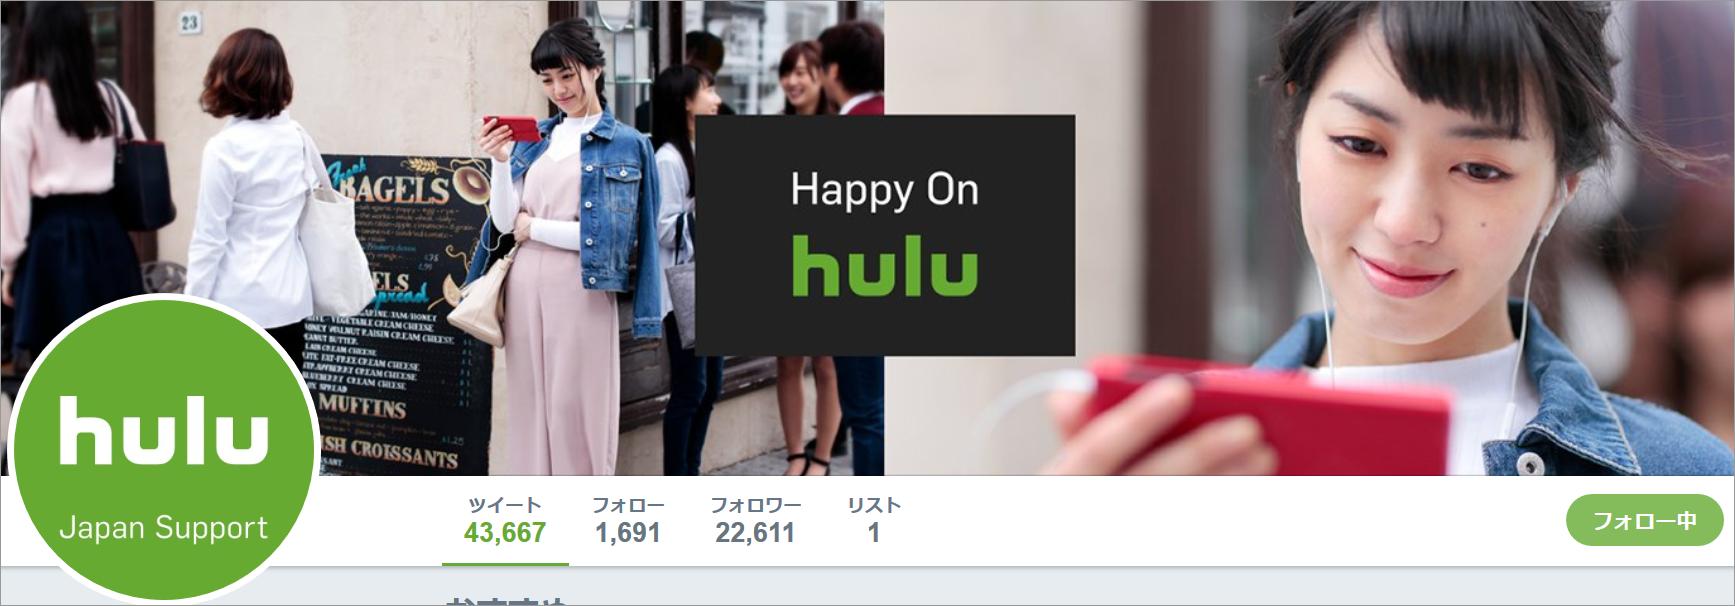 Huluカスタマーサポート_Twitterアカウント画面イメージ